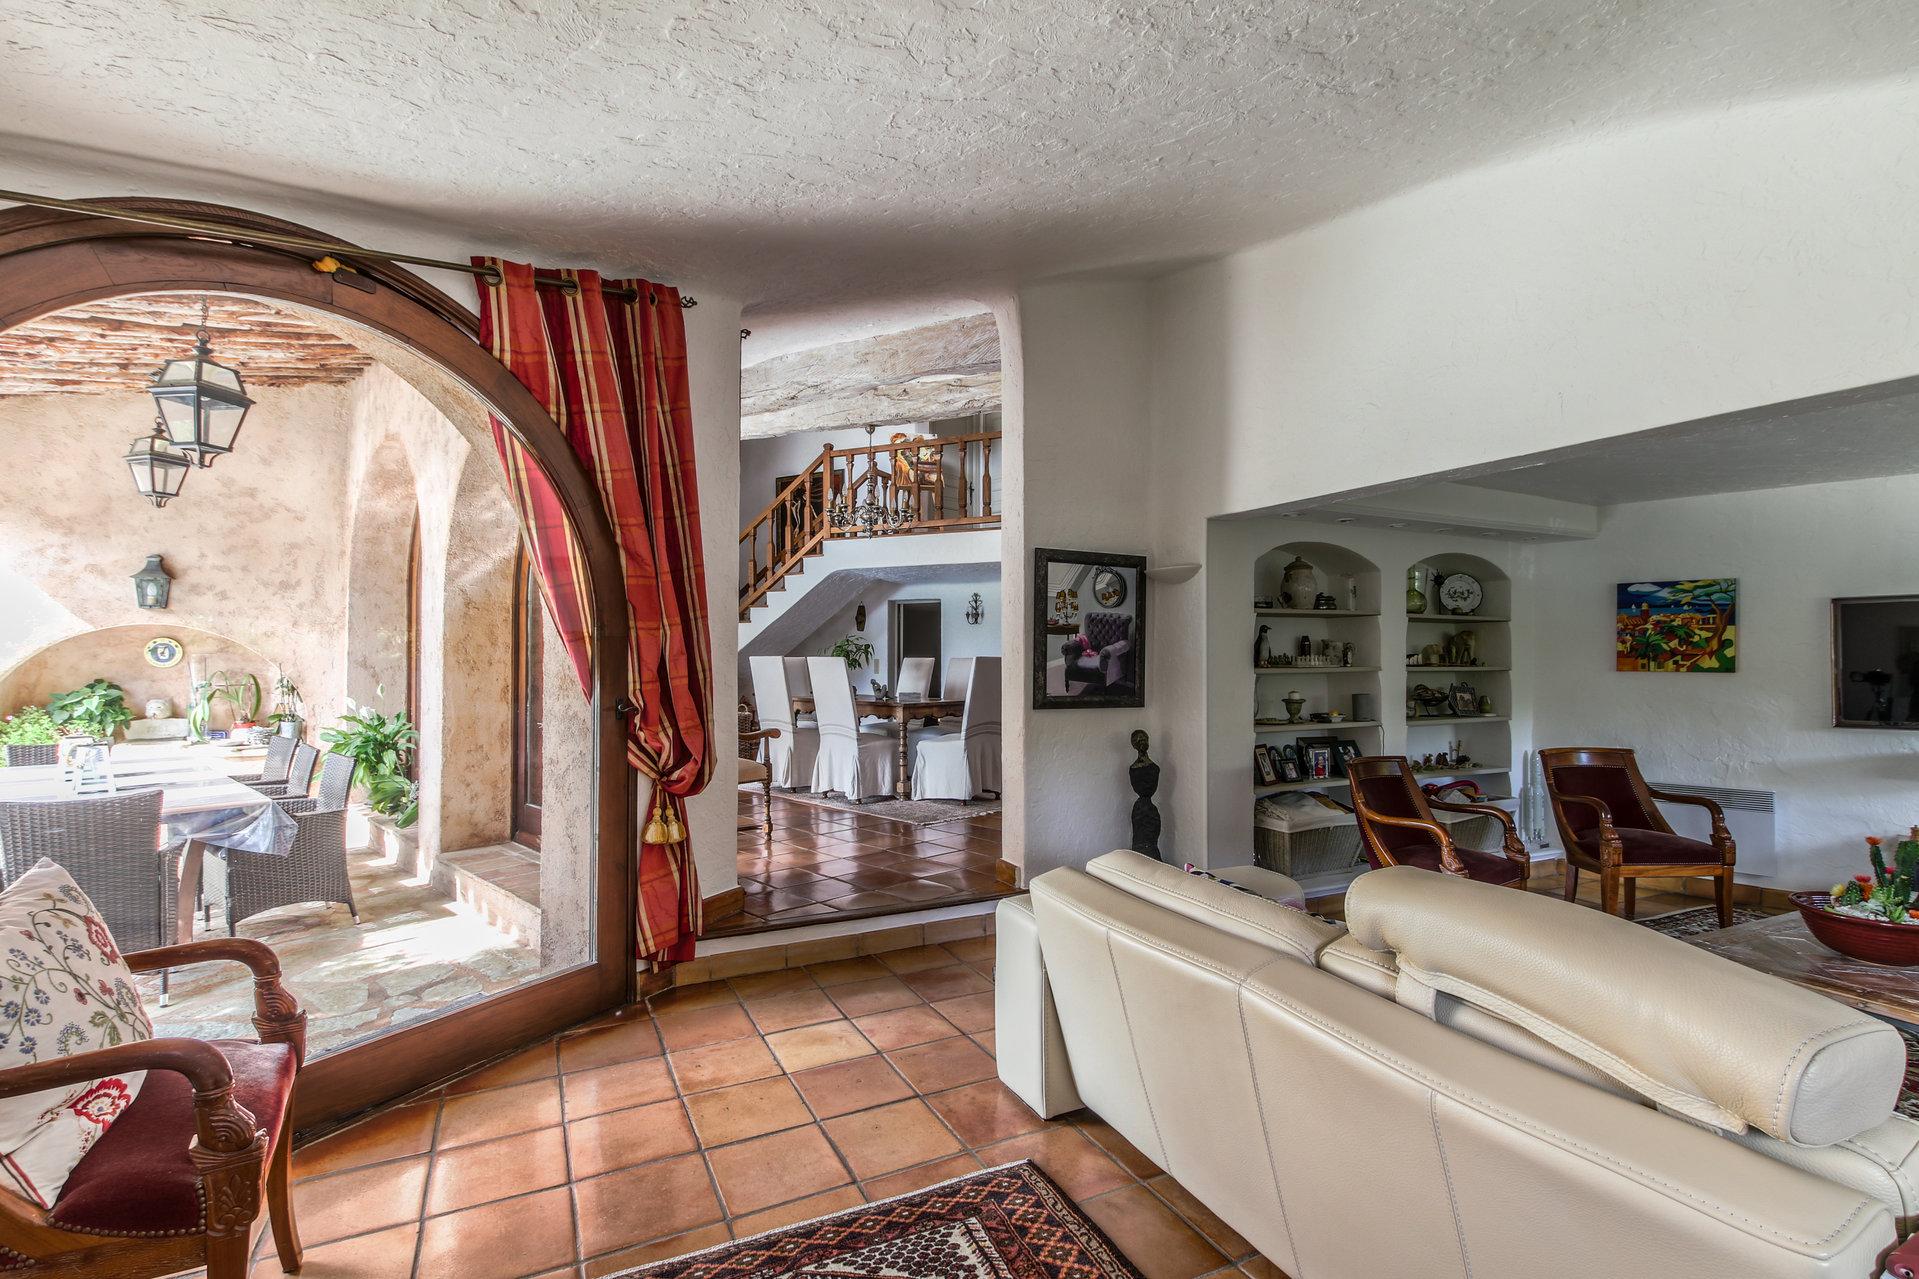 For sale CENTRAL PARK Architect villa 7 rooms